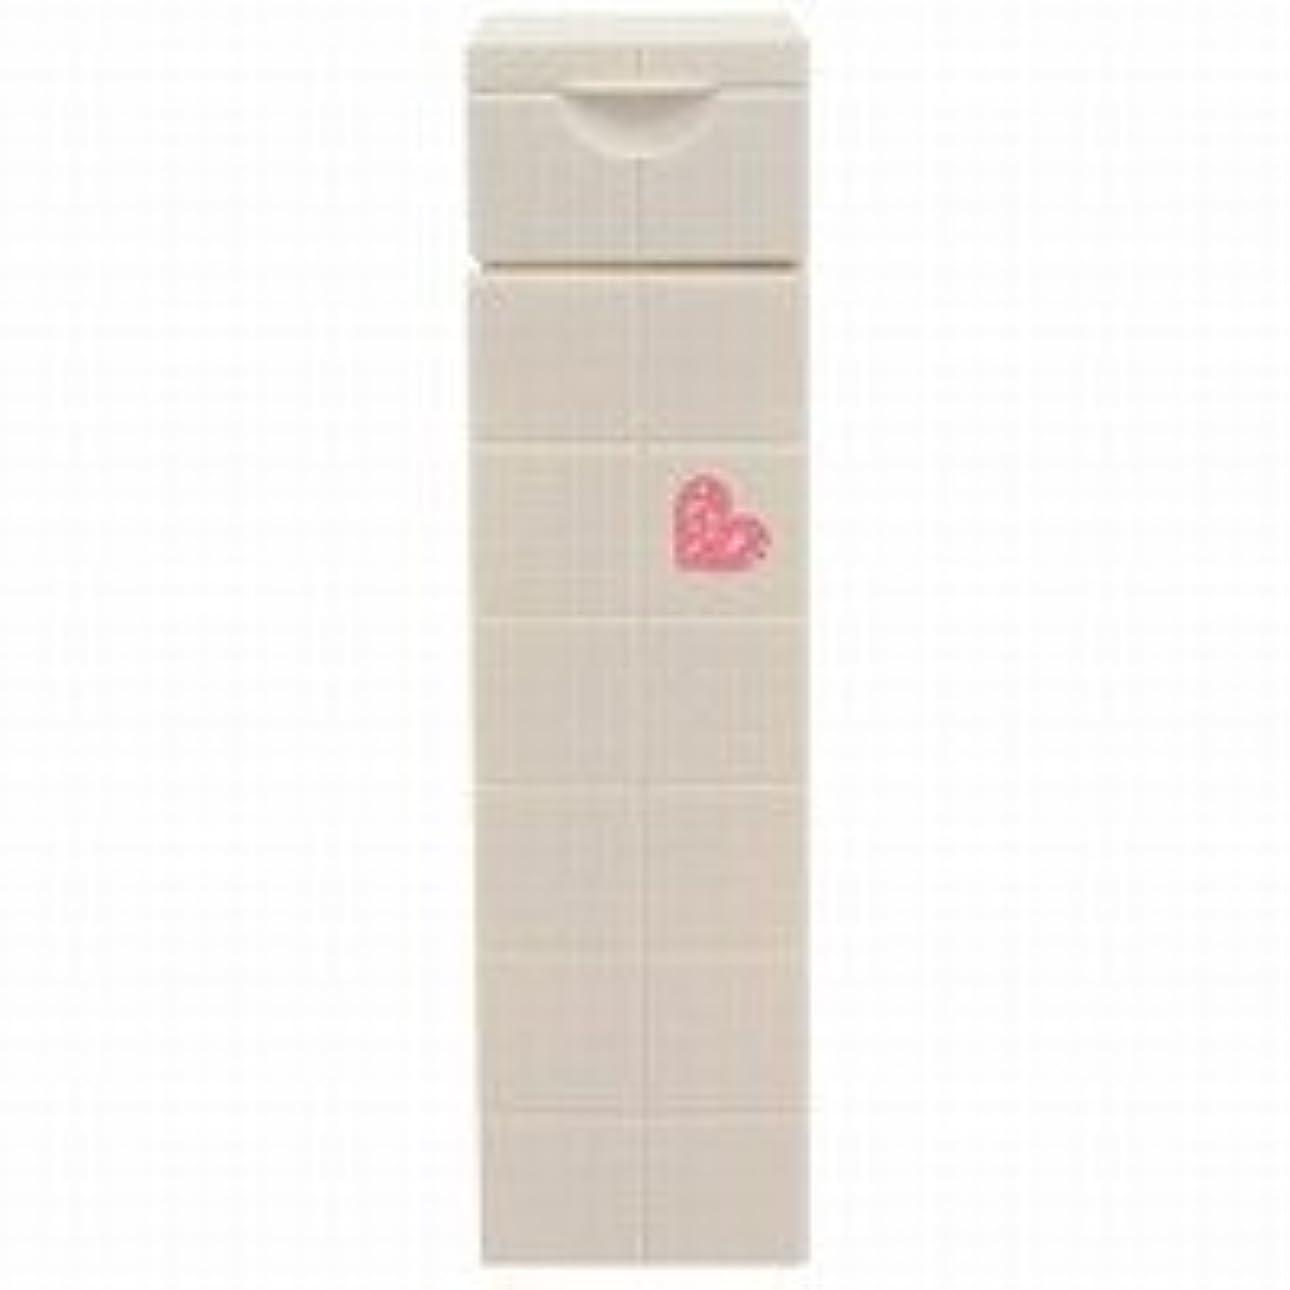 【X2個セット】 アリミノ ピース プロデザインシリーズ モイストミルク バニラ 200ml